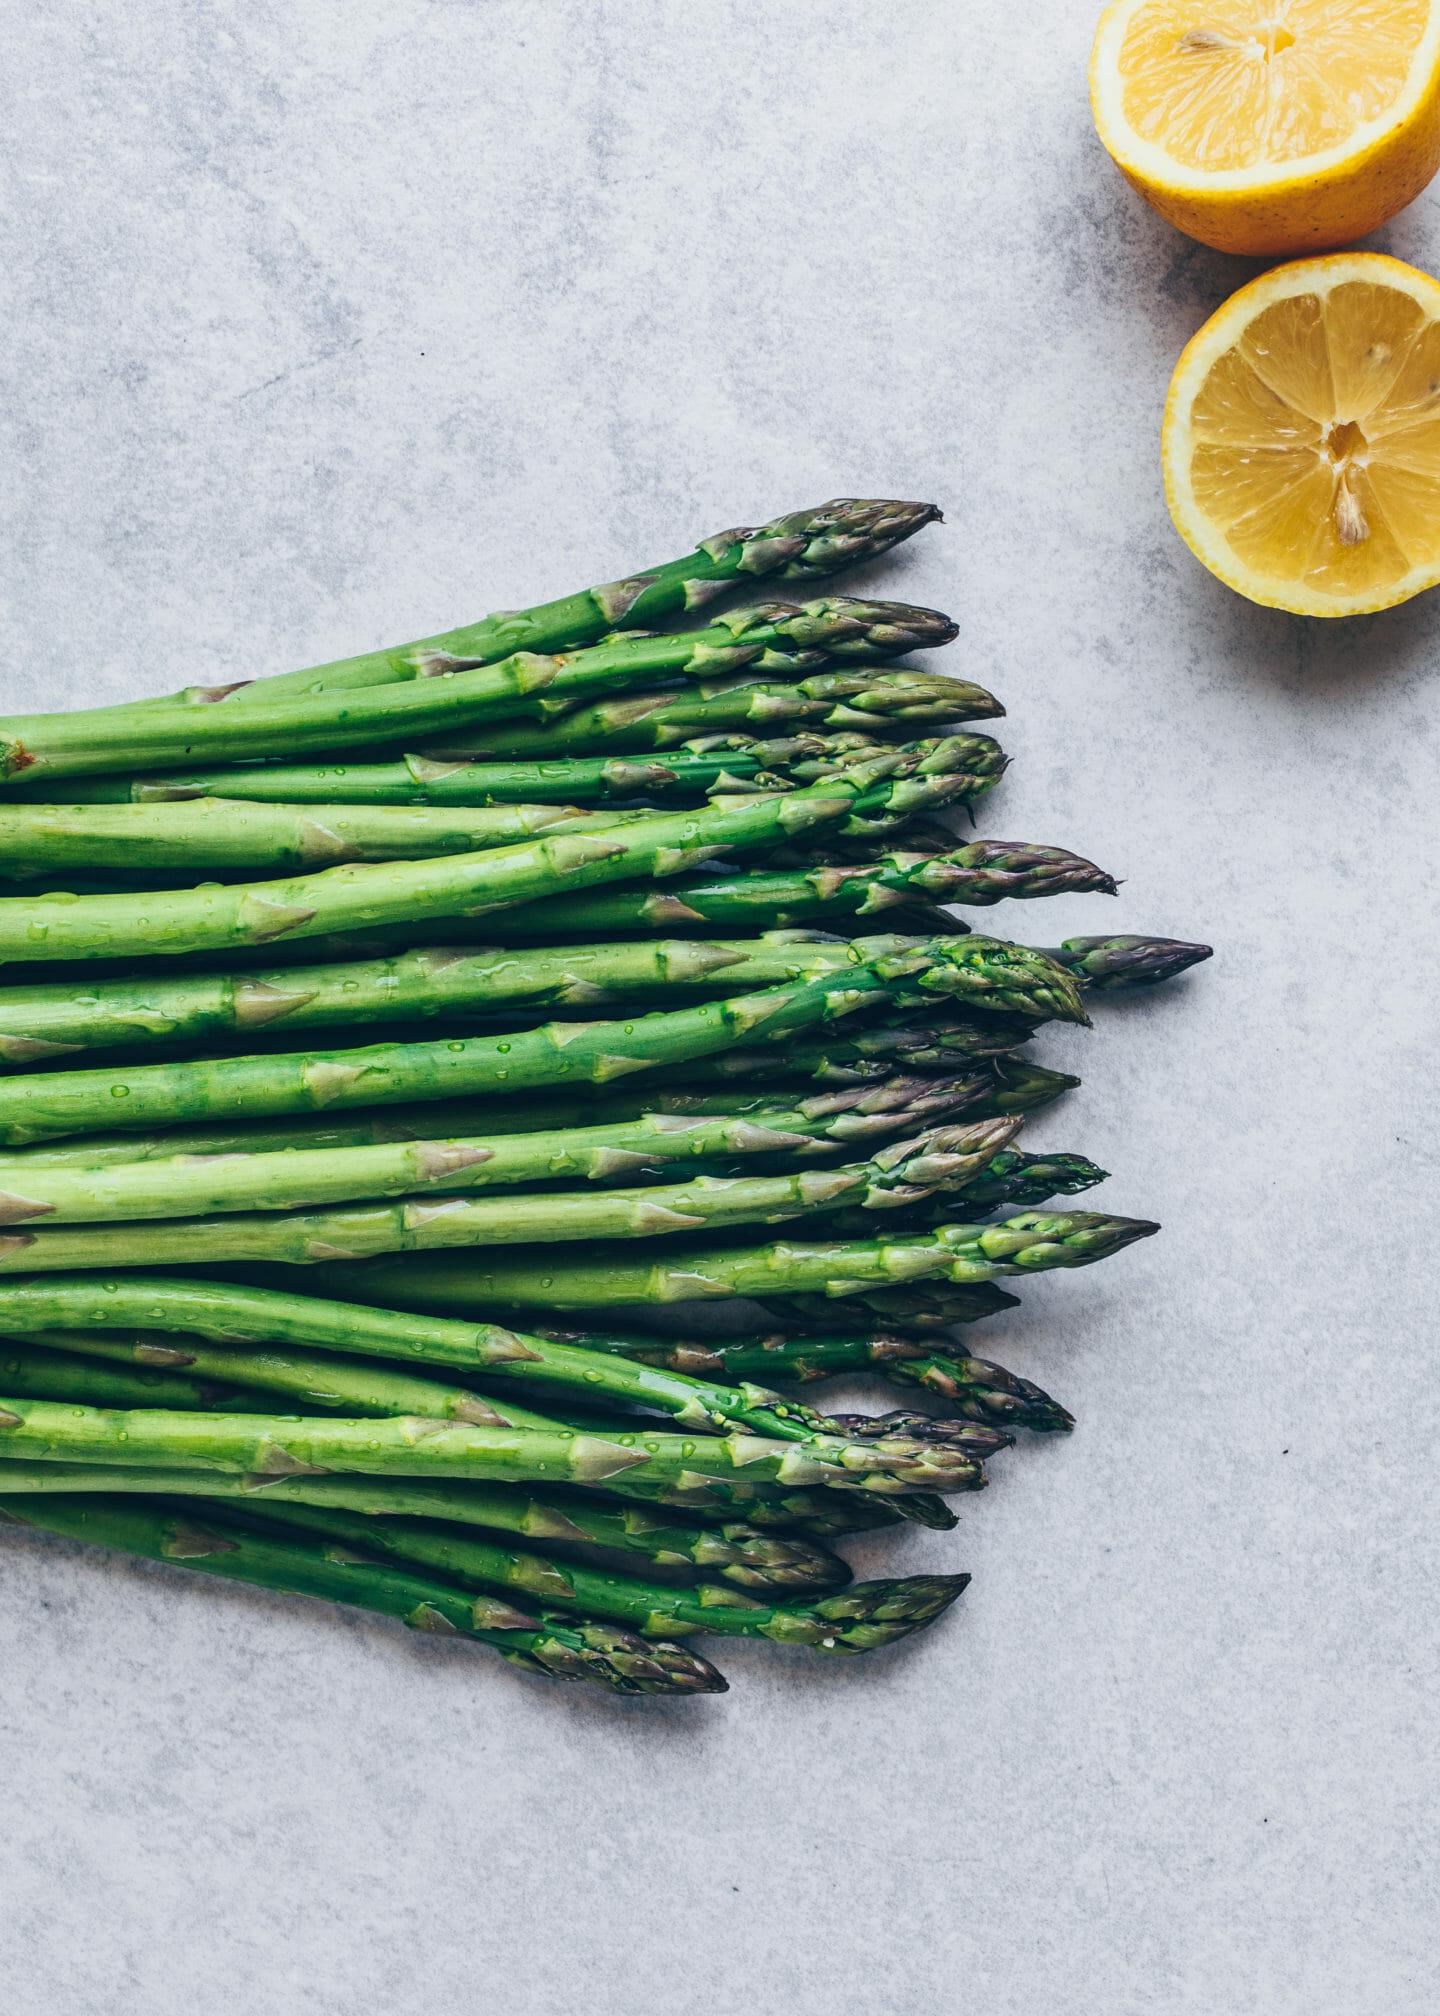 green asparagus and lemon